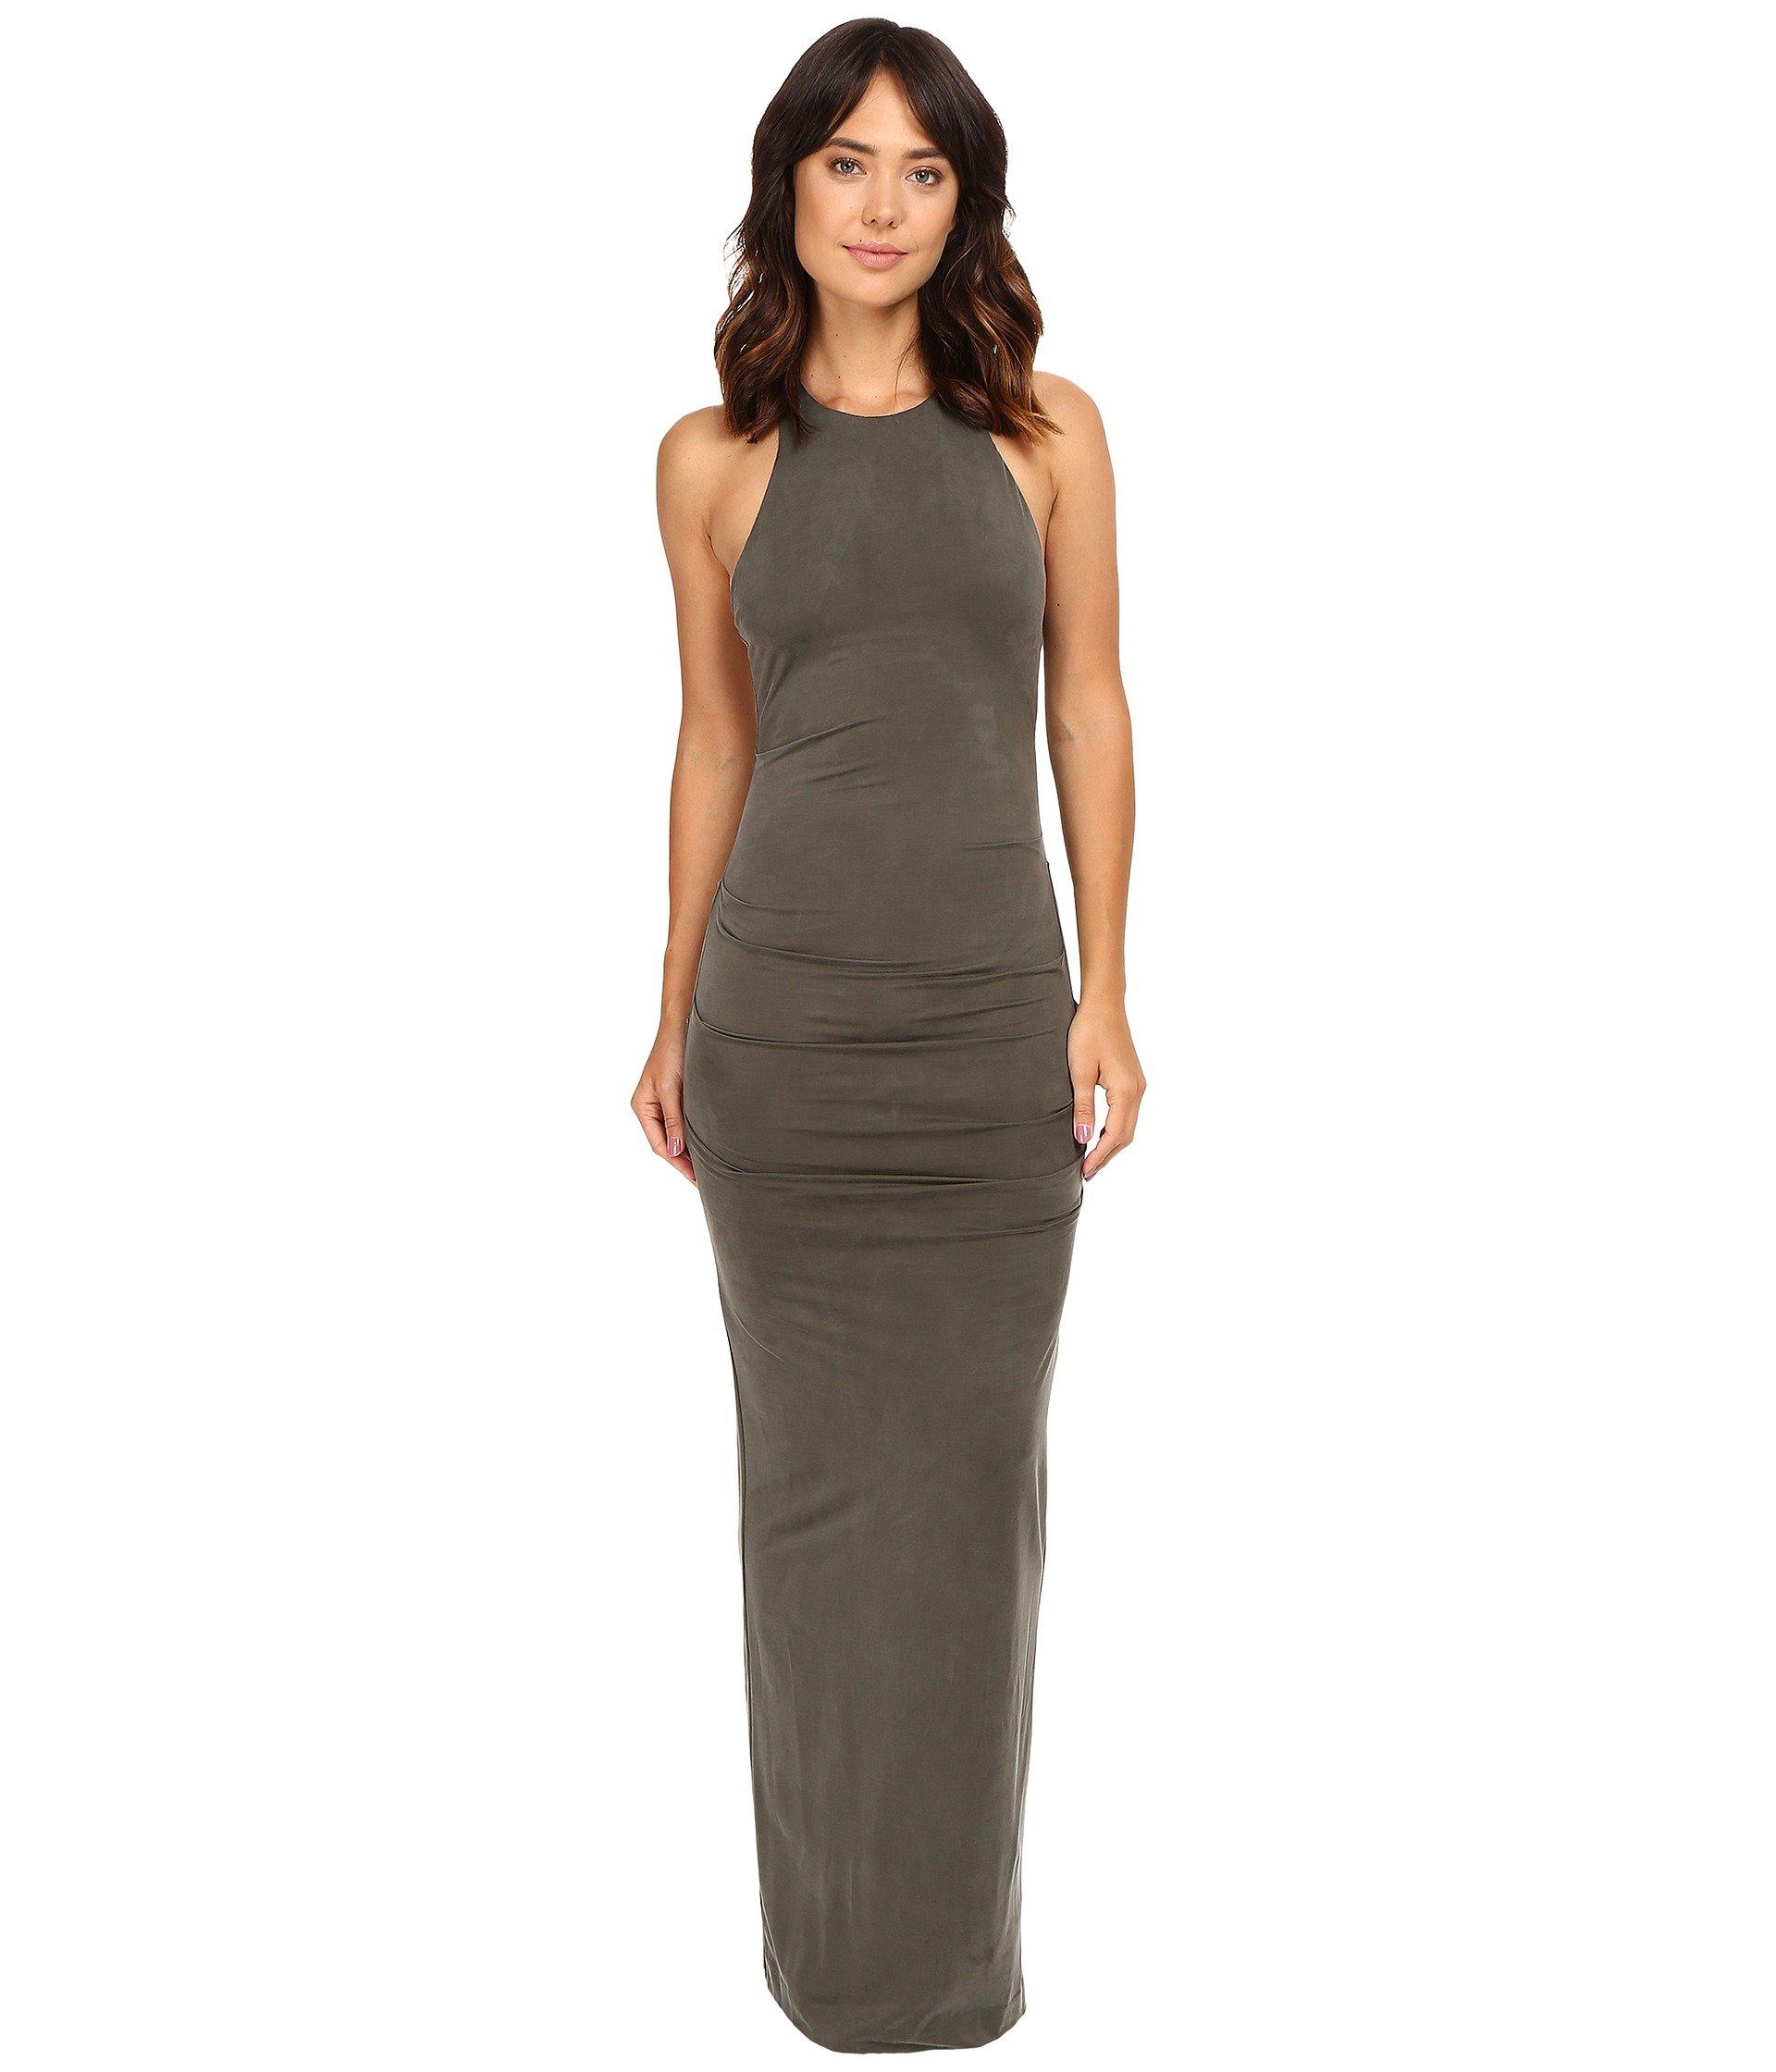 Nicole Miller Champagne Dress